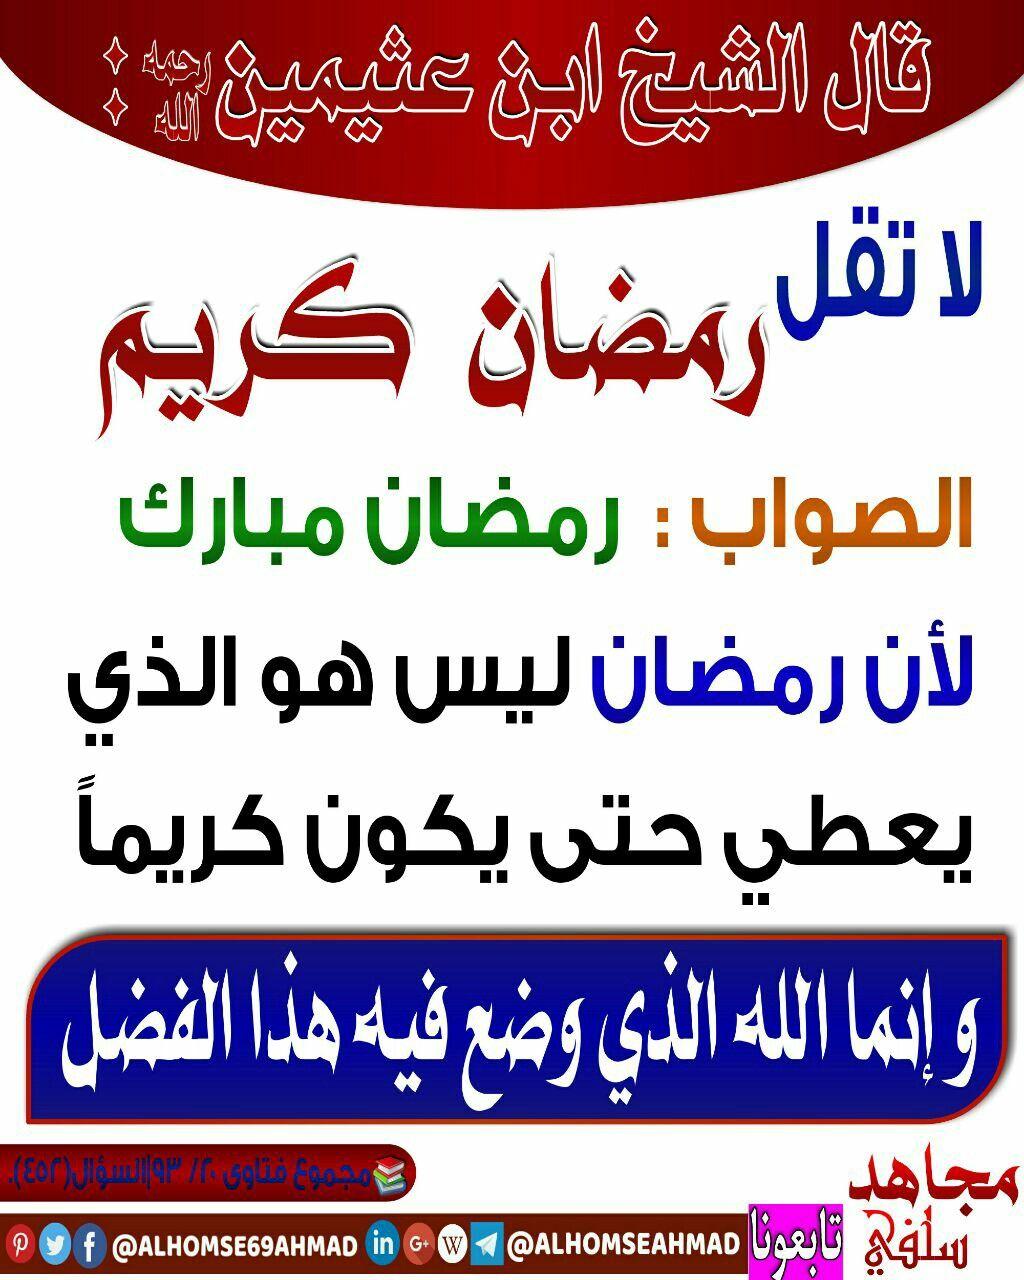 Pin By زهرة الياسمين On رمضان Calligraphy Arabic Calligraphy 90 S